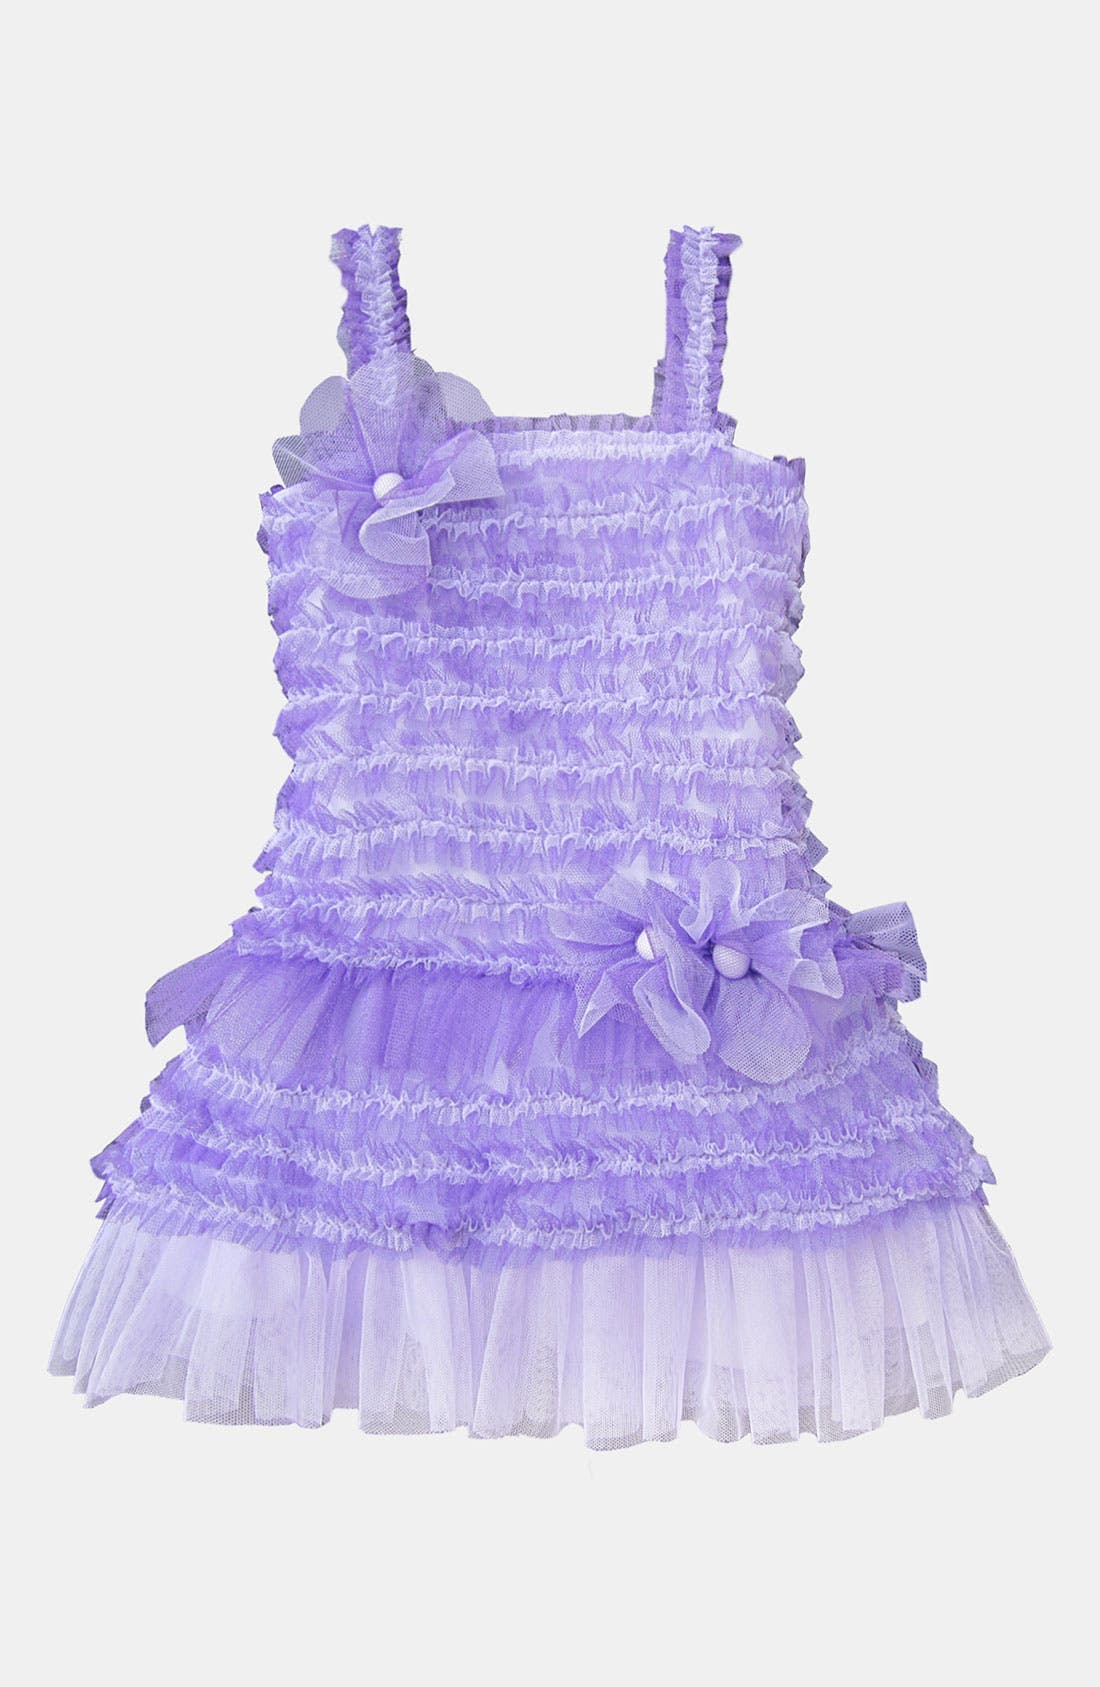 Alternate Image 1 Selected - Isobella & Chloe Tutu Dress (Baby)